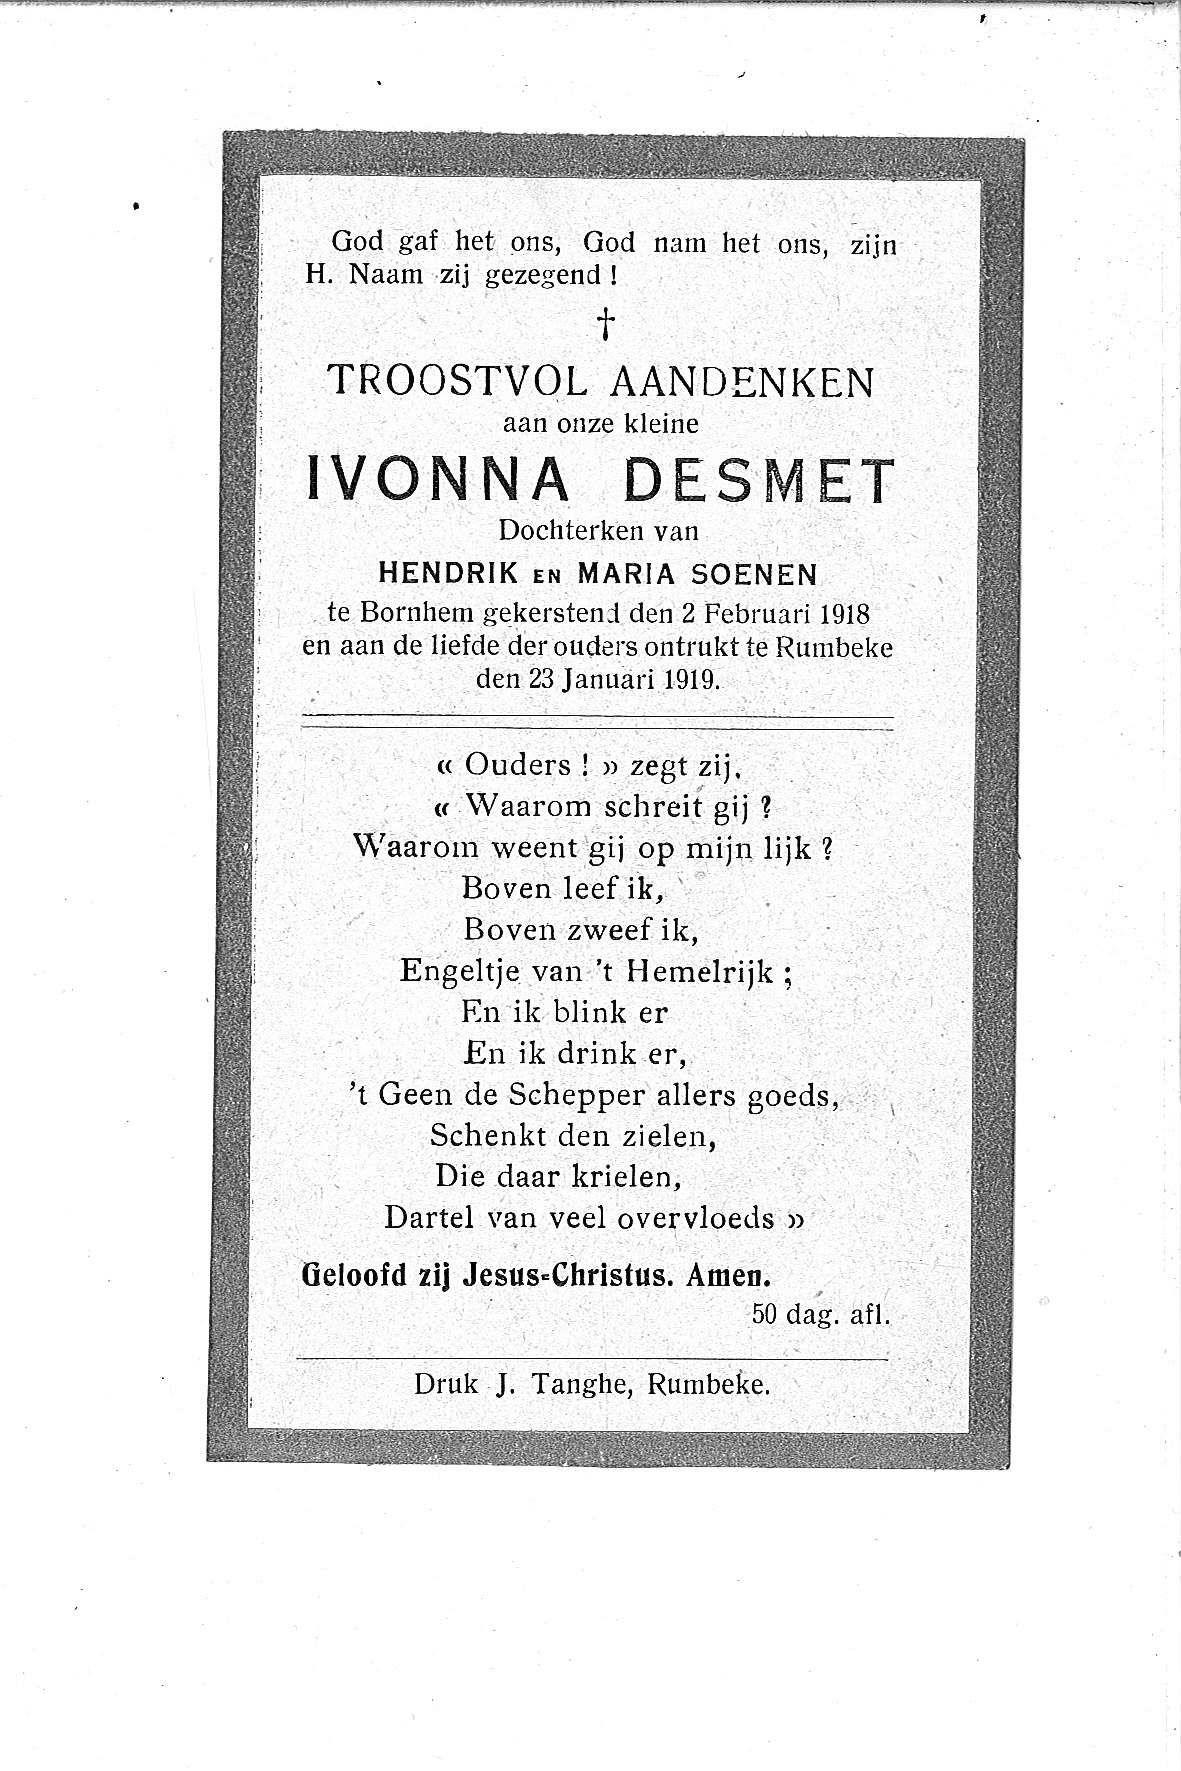 Ivonna (1919) 20120424083759_00199.jpg